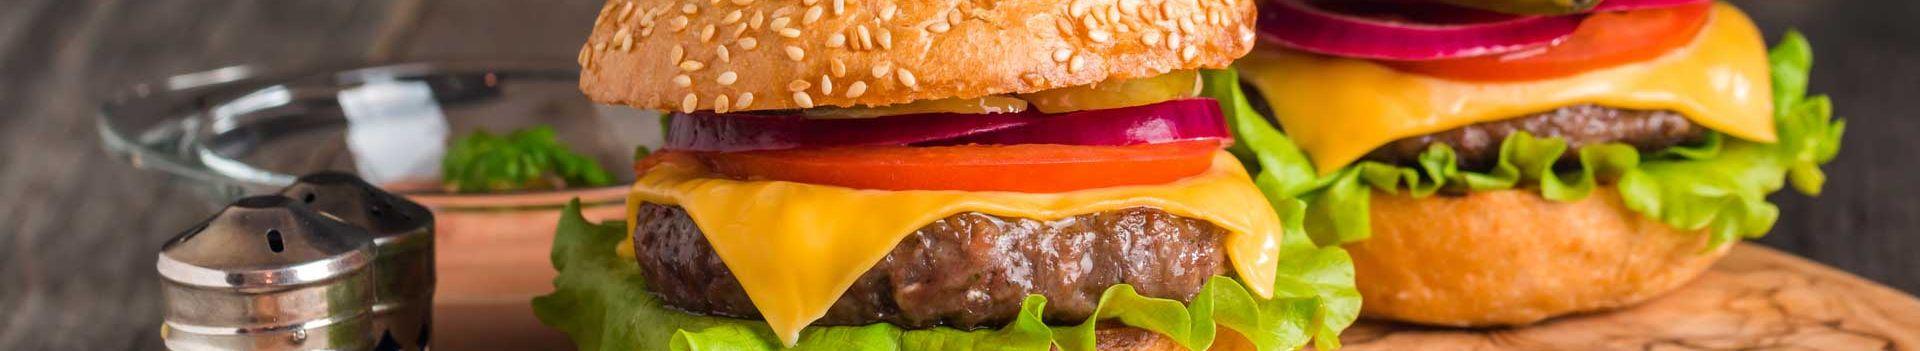 Burger Station Lieferservice in Wien